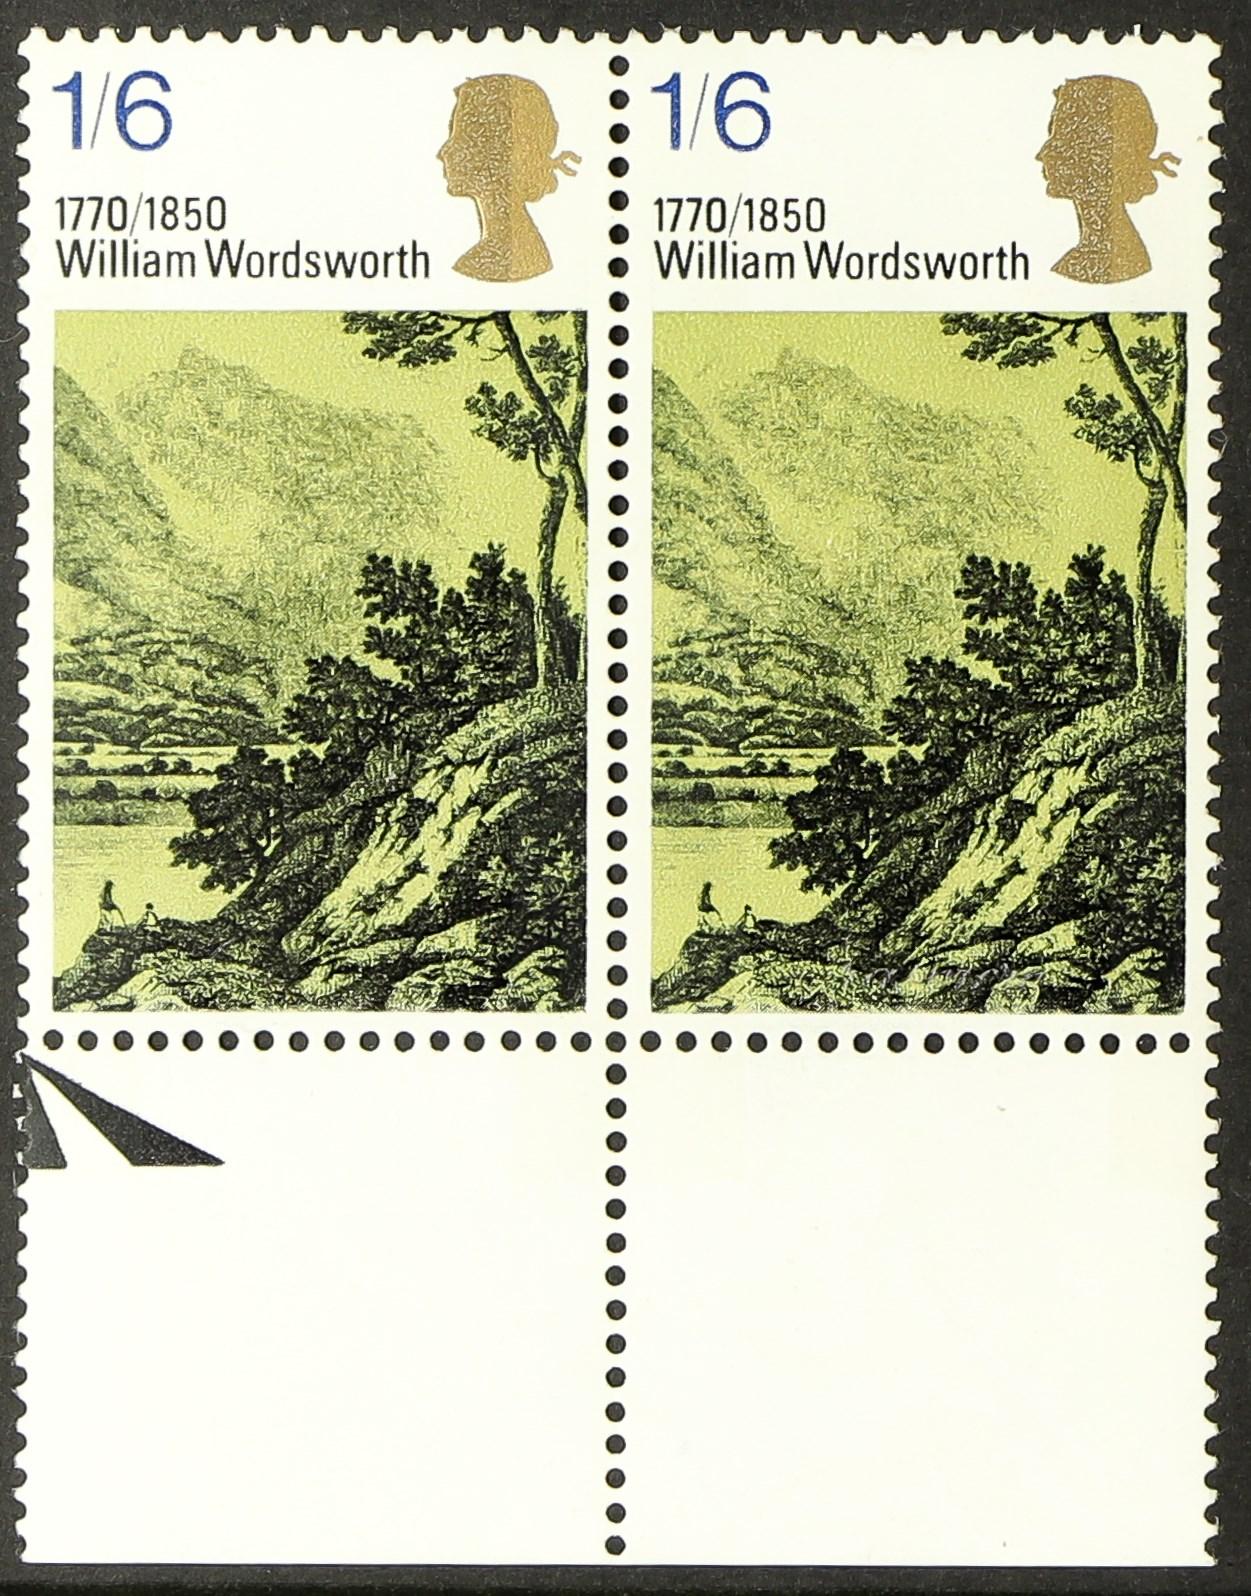 GB.ELIZABETH II 1970 LITERARY ANNIVERSARIES 1s.6d lower marginal pair, the left stamp showing silver